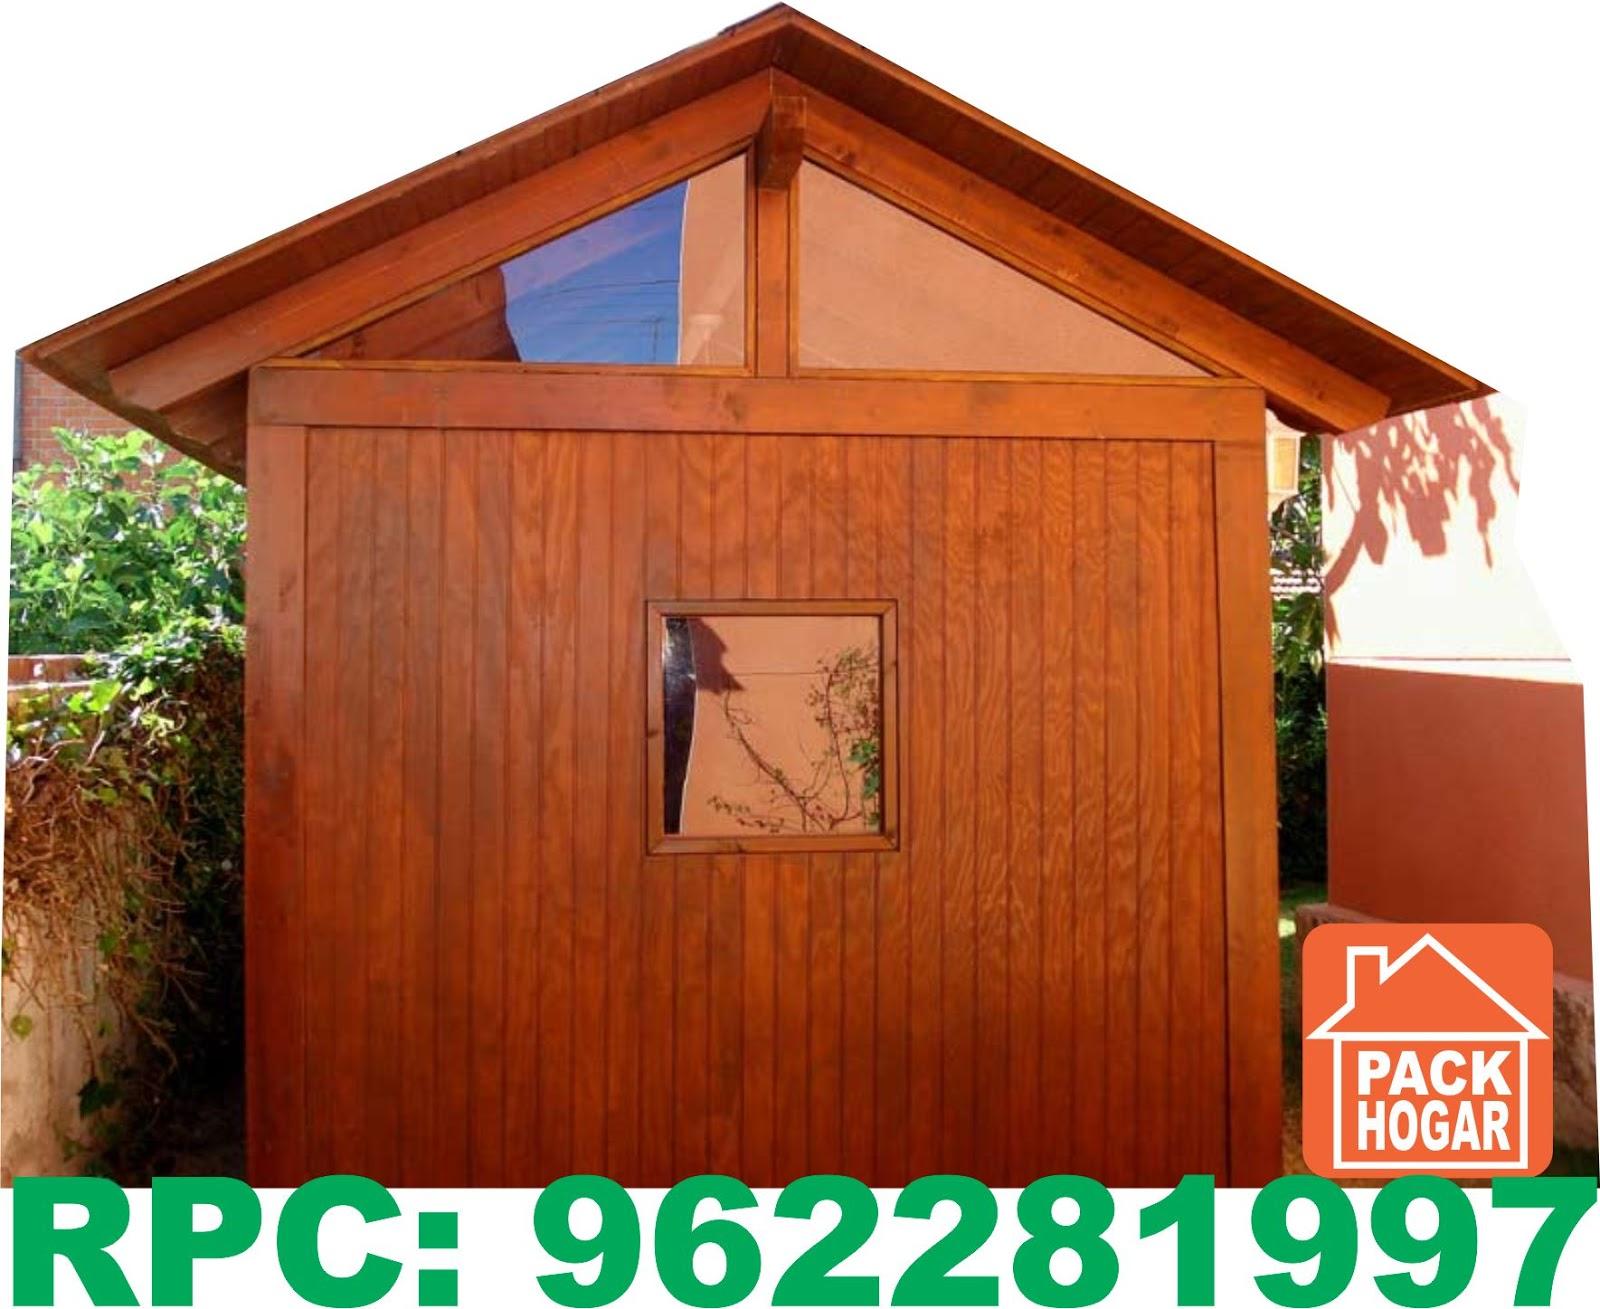 casetas cuartos prefabricadas para azoteas packhogar